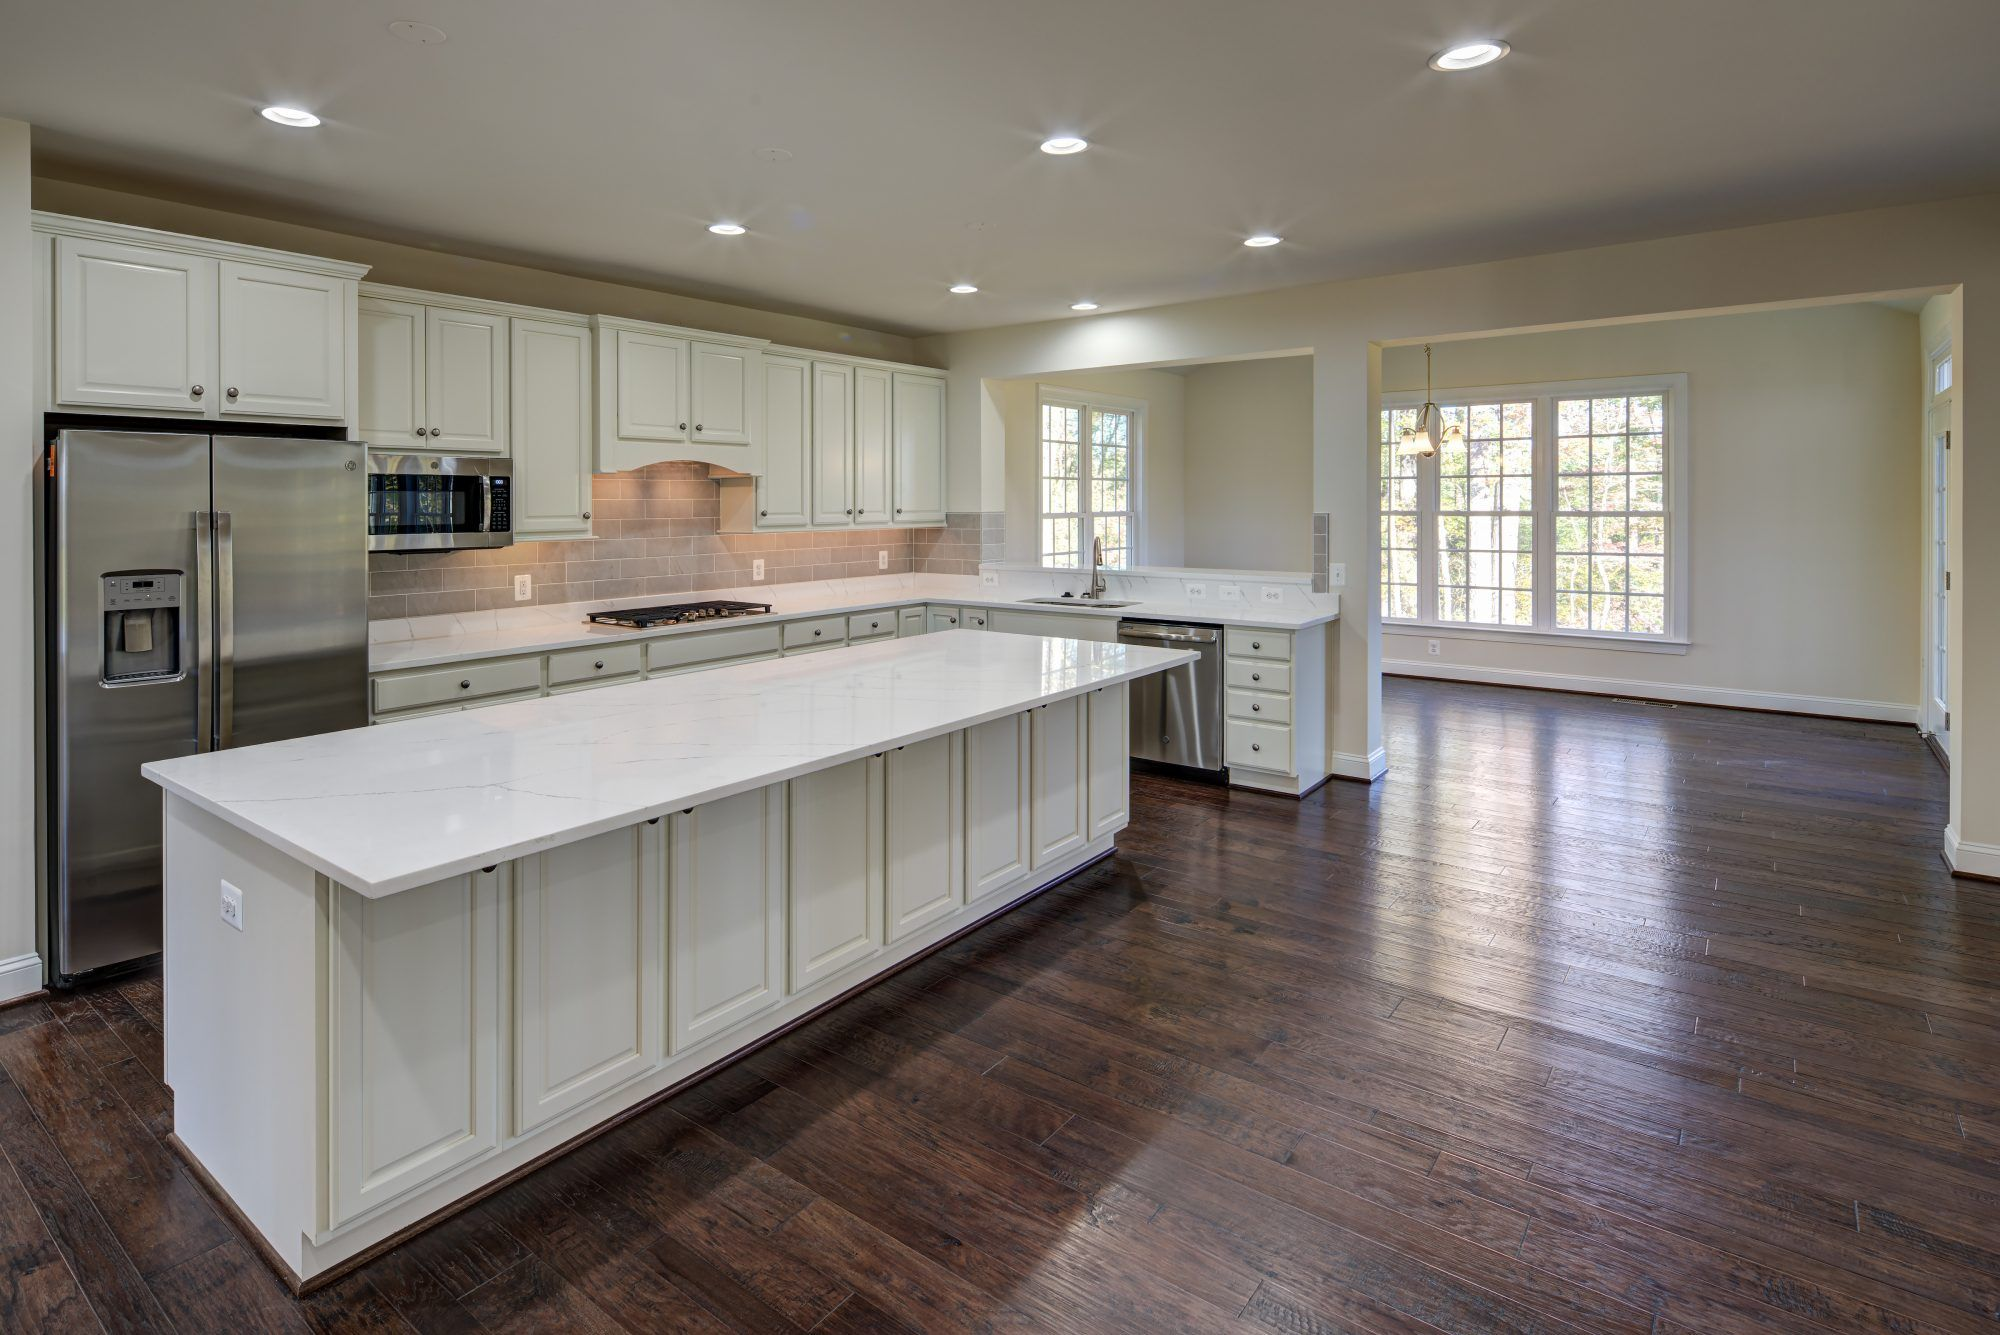 Kitchen featured in The Pinehurst By CarrHomes in Washington, VA